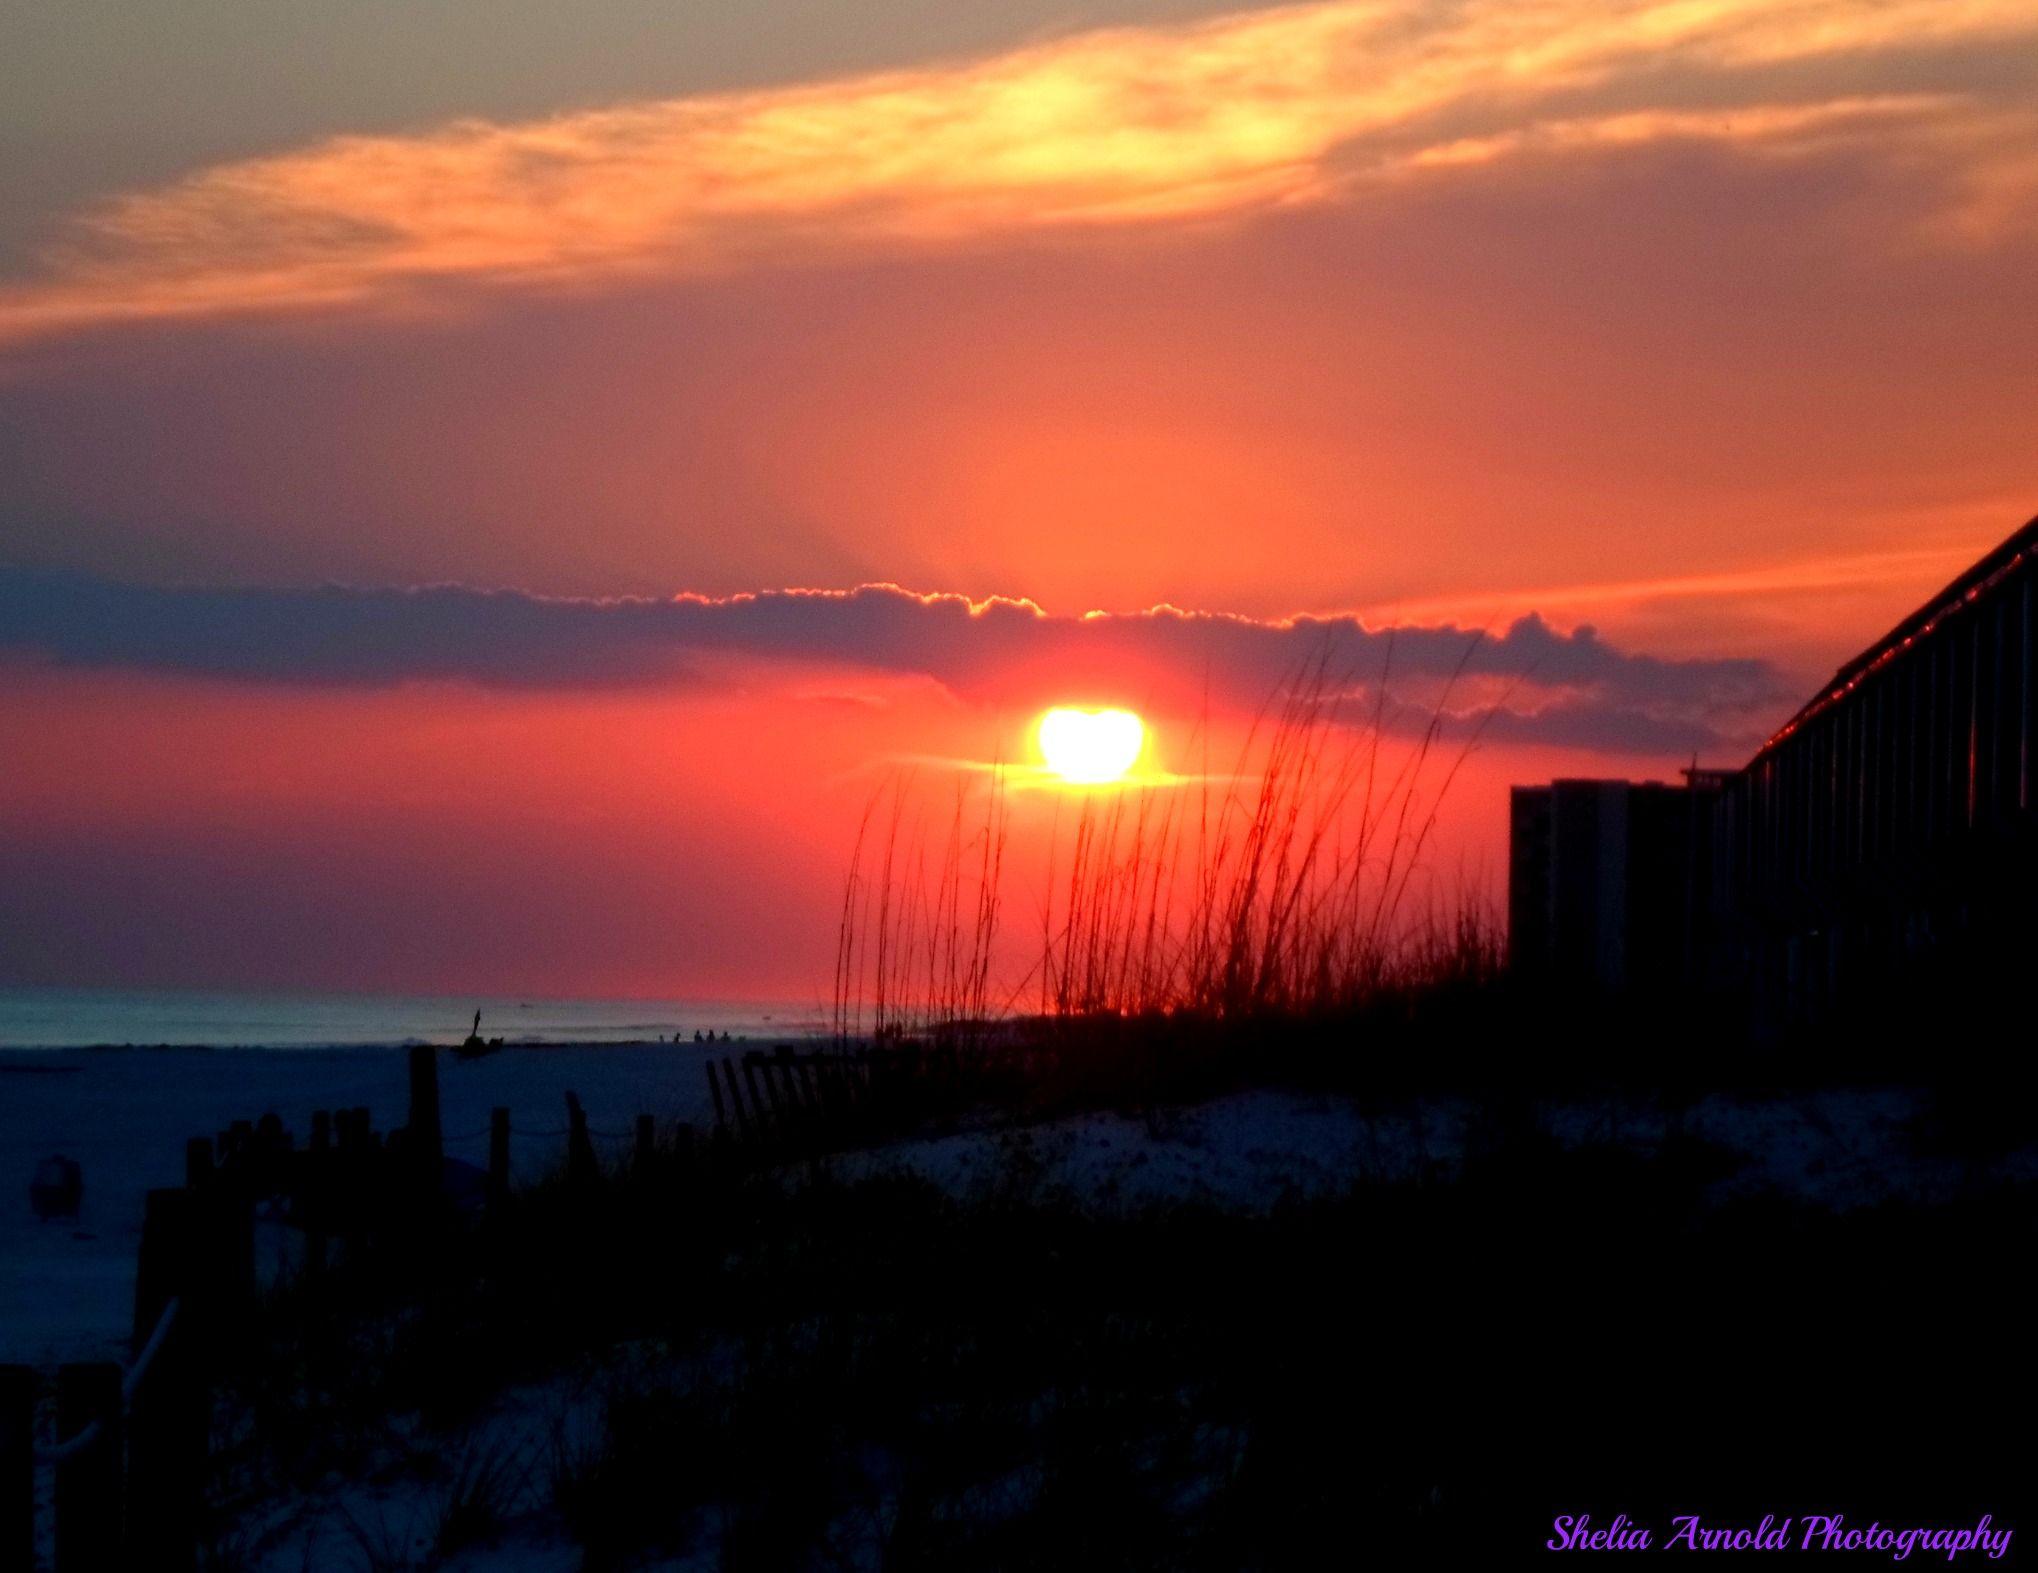 Sunset-Panama City Beach, Fl